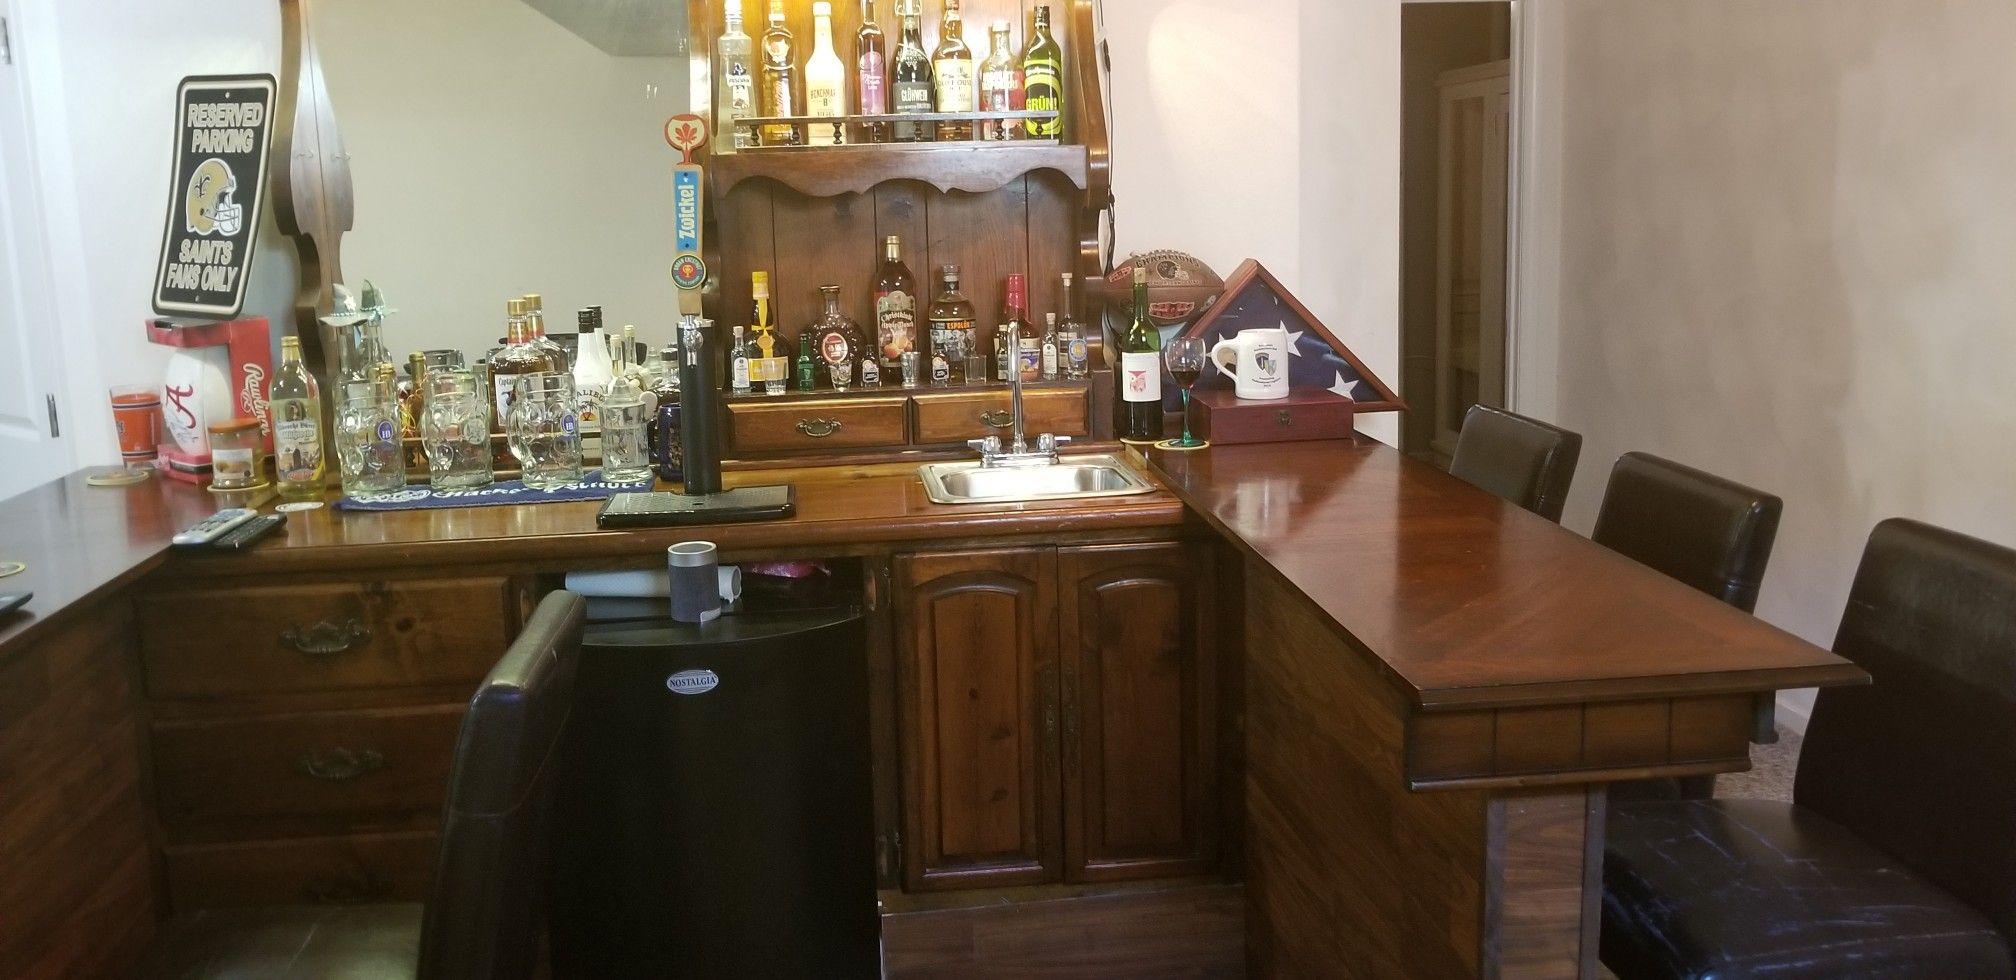 Custom Wet Bar Found An Old Dresser With Top Hutch